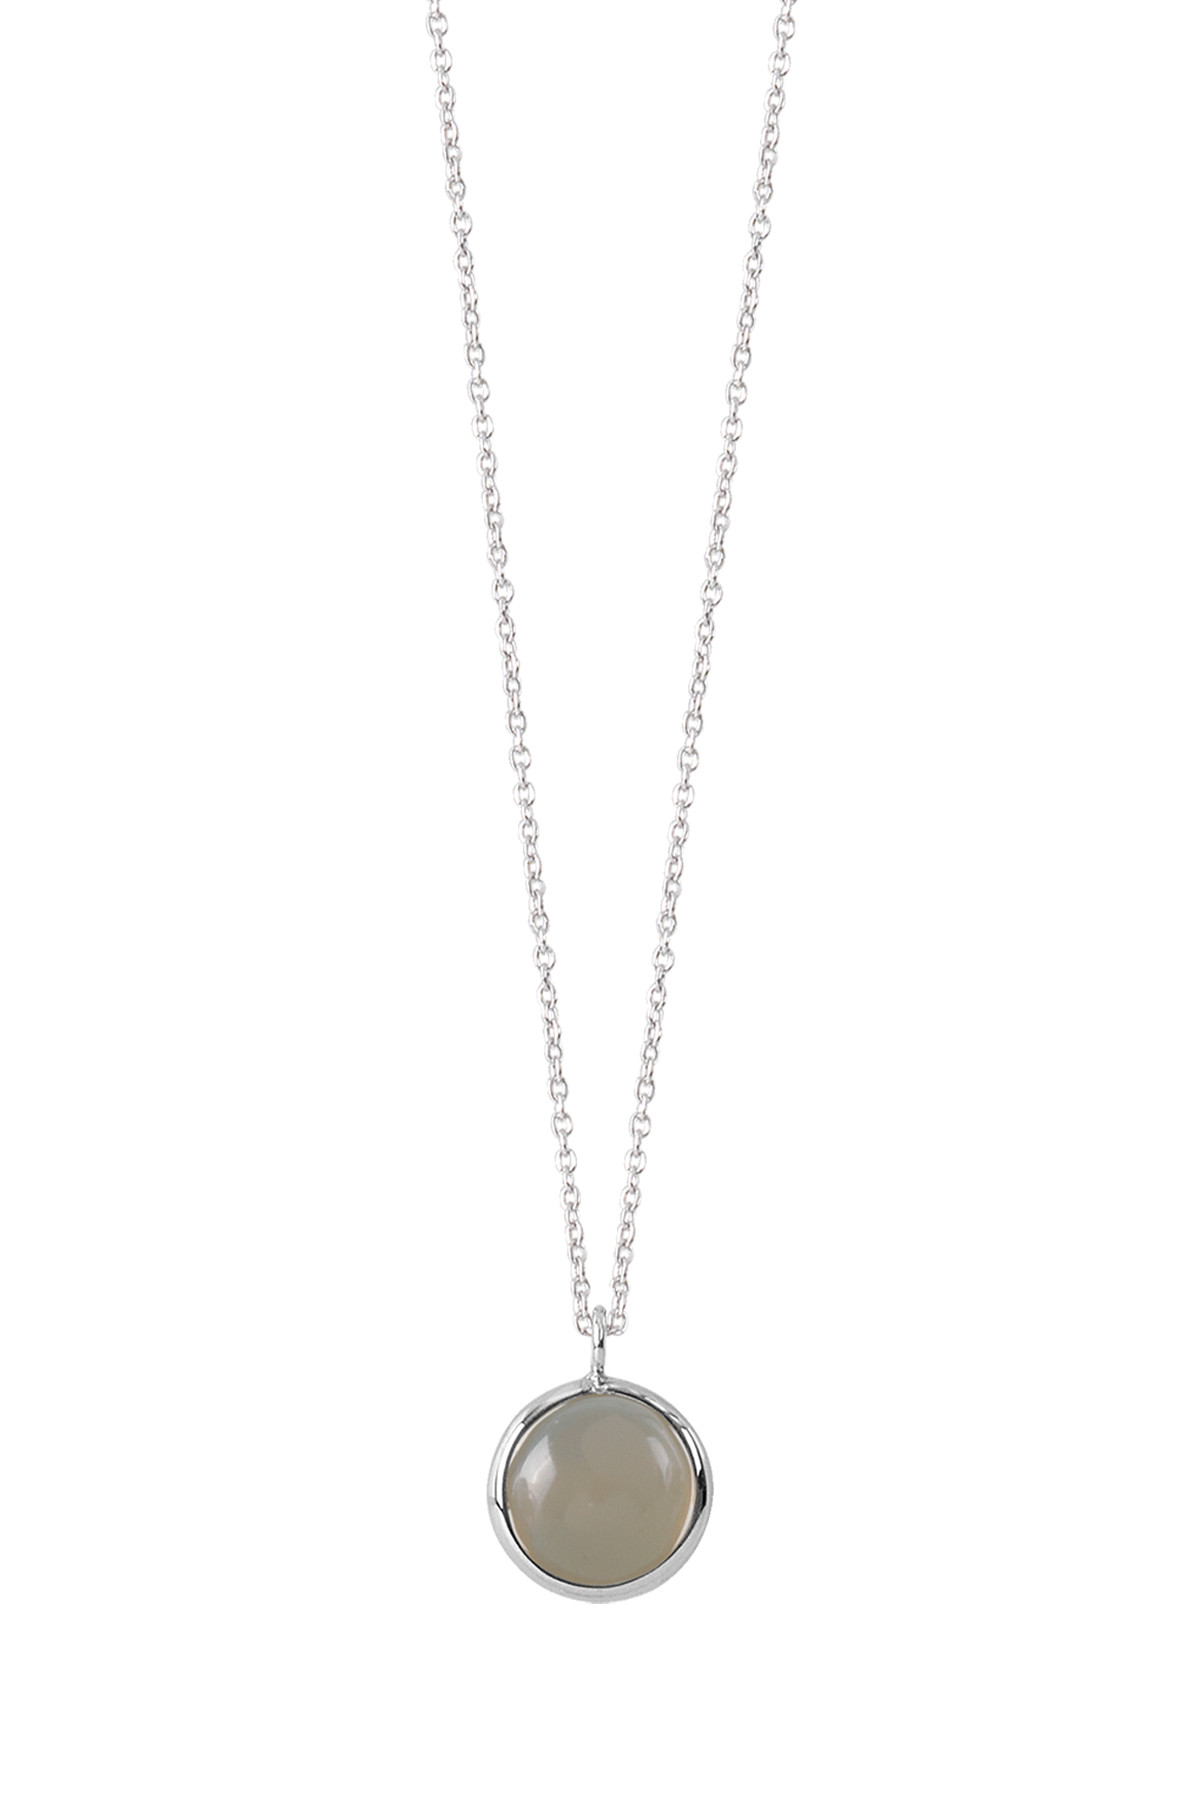 Image of   DYRBERG/KERN BRISE HALSKÆDE 400736 (Silver, Grey, ONESIZE)